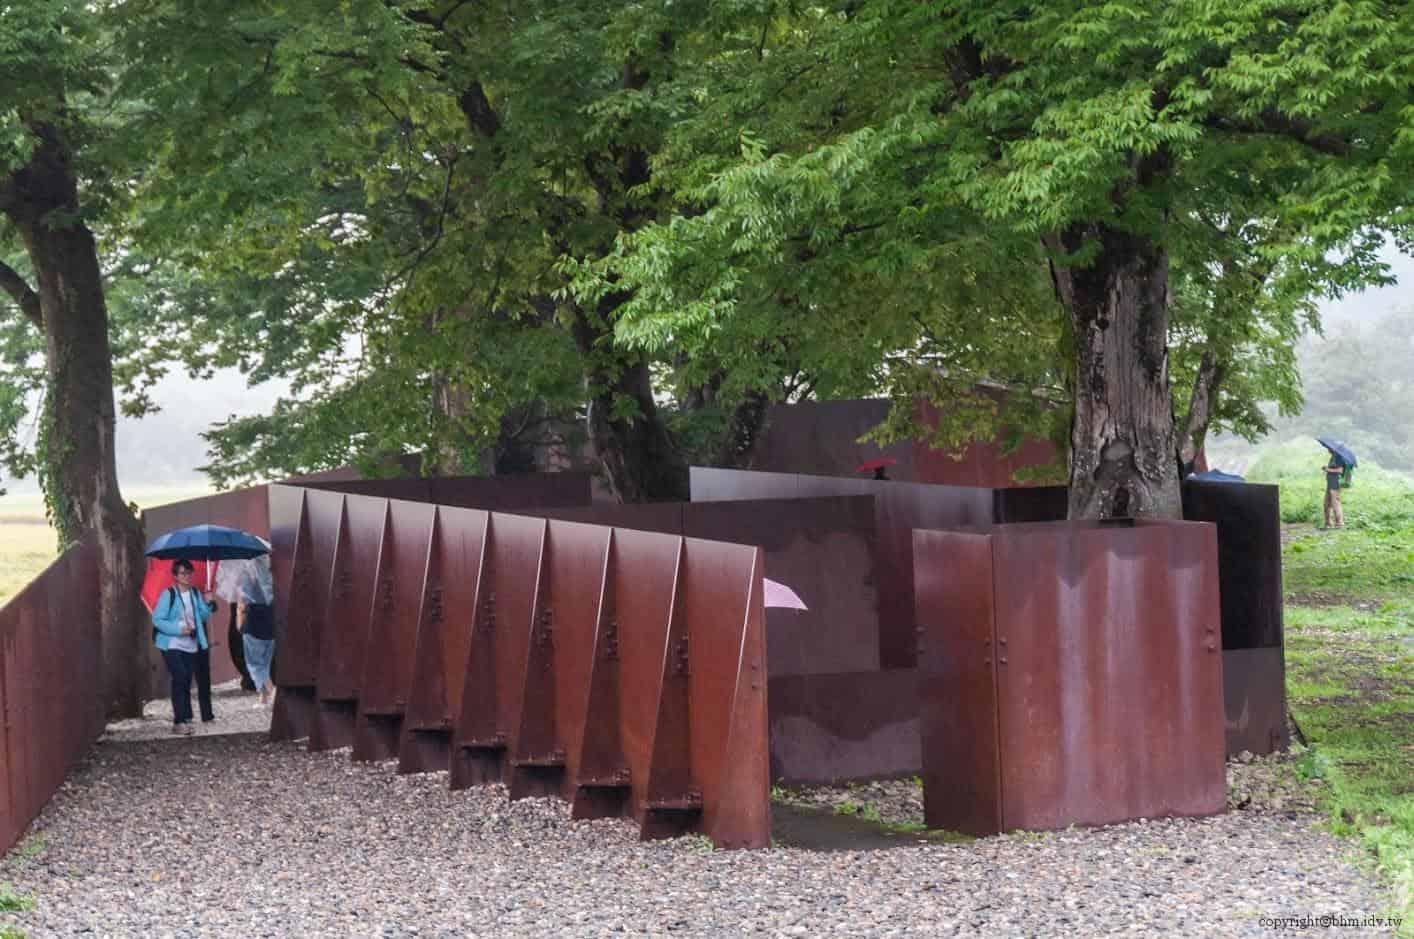 Casagrande&Rintala建築事務所,對峙的牆POTEMKIN,採用冰冷的不鏽鋼材表現明顯的空間阻隔 藝術融於入環境 藝術融於入環境 potemkin 01